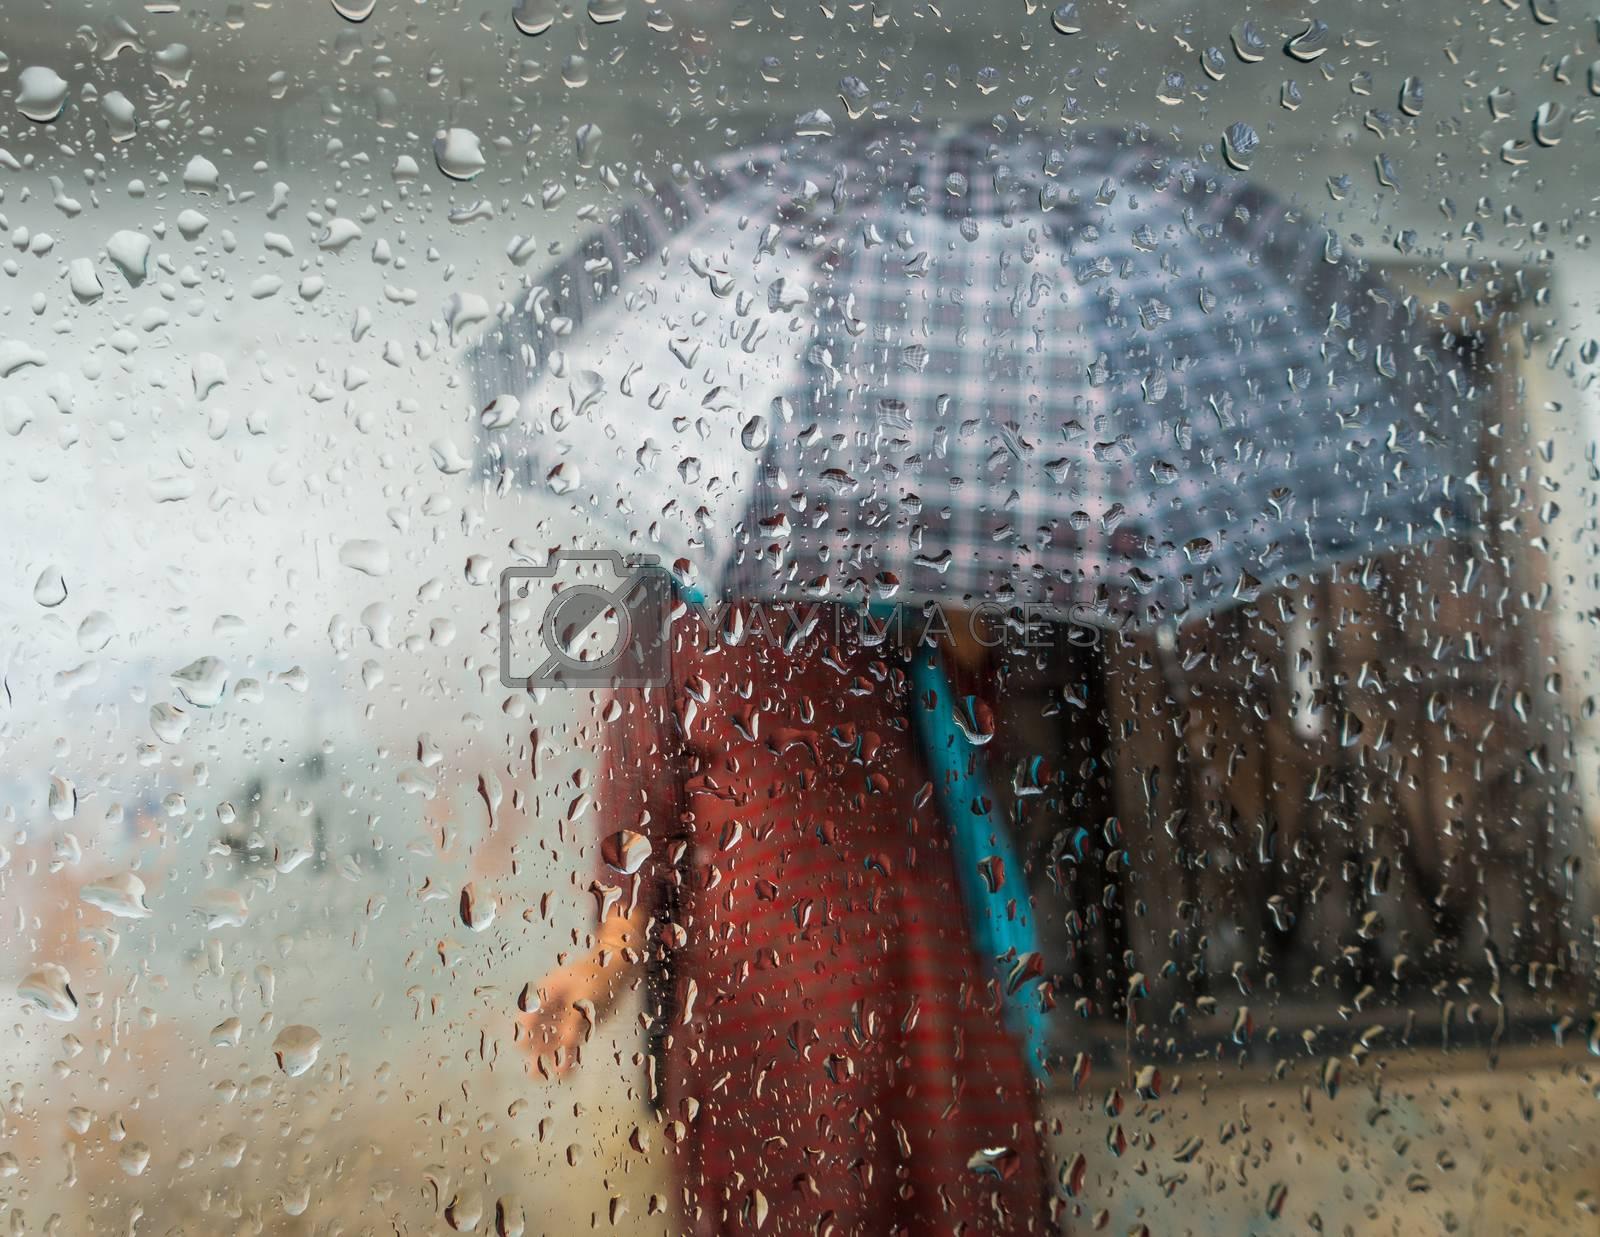 Monsoon season in Kathmandu, Nepal. Woman holding an umbrella seen through a window. Focus on droplets on glass.